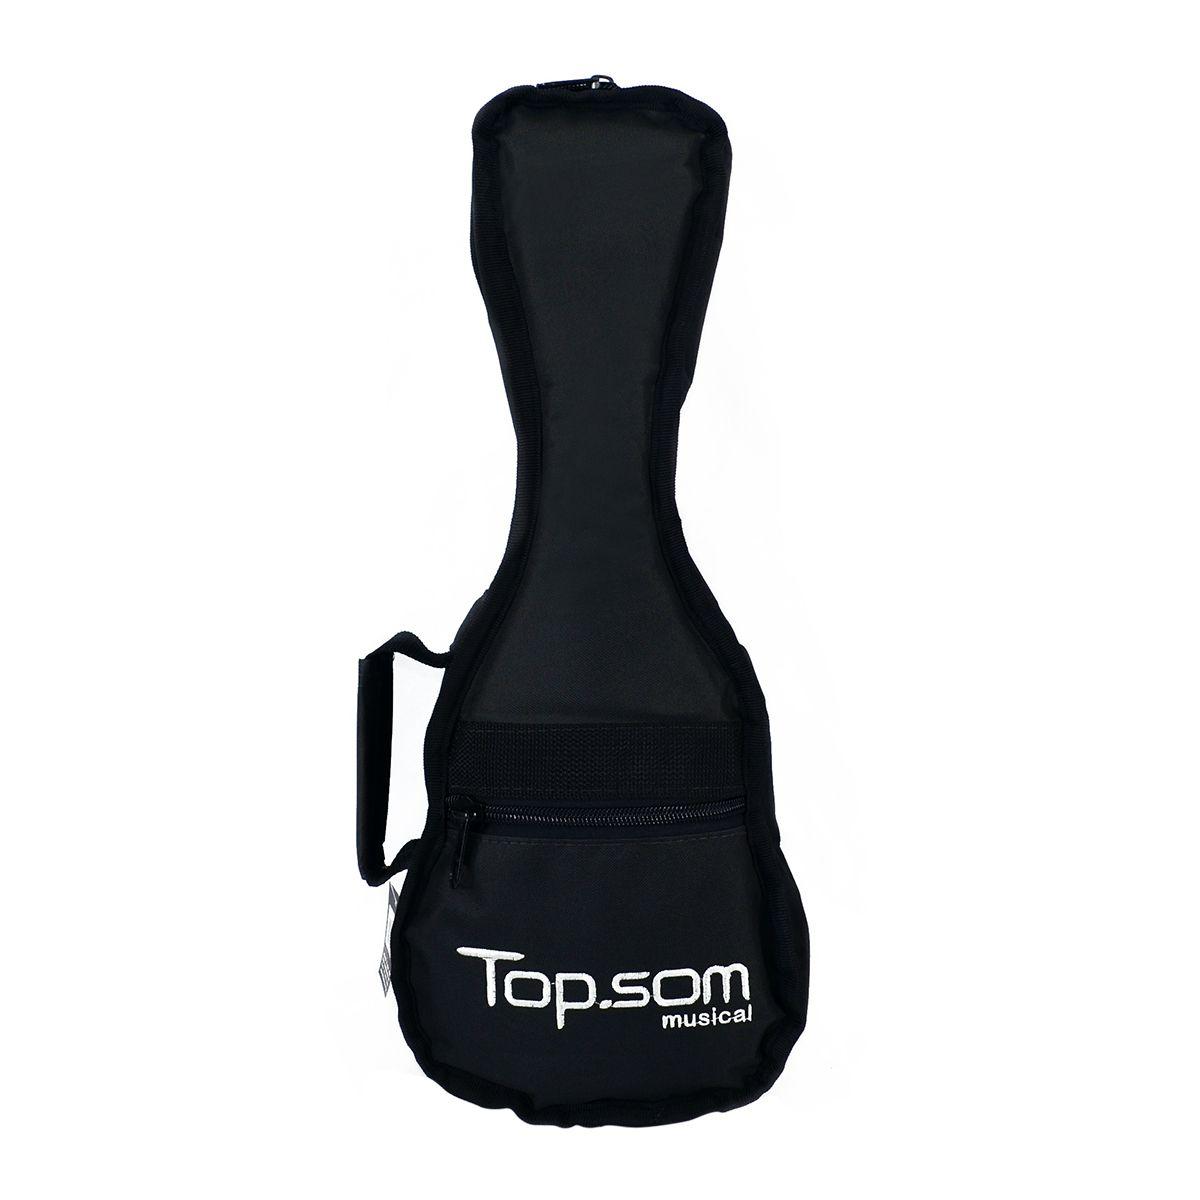 Capa de Ukulele Soprano Acolchoada Impermeável - Top Som Bags